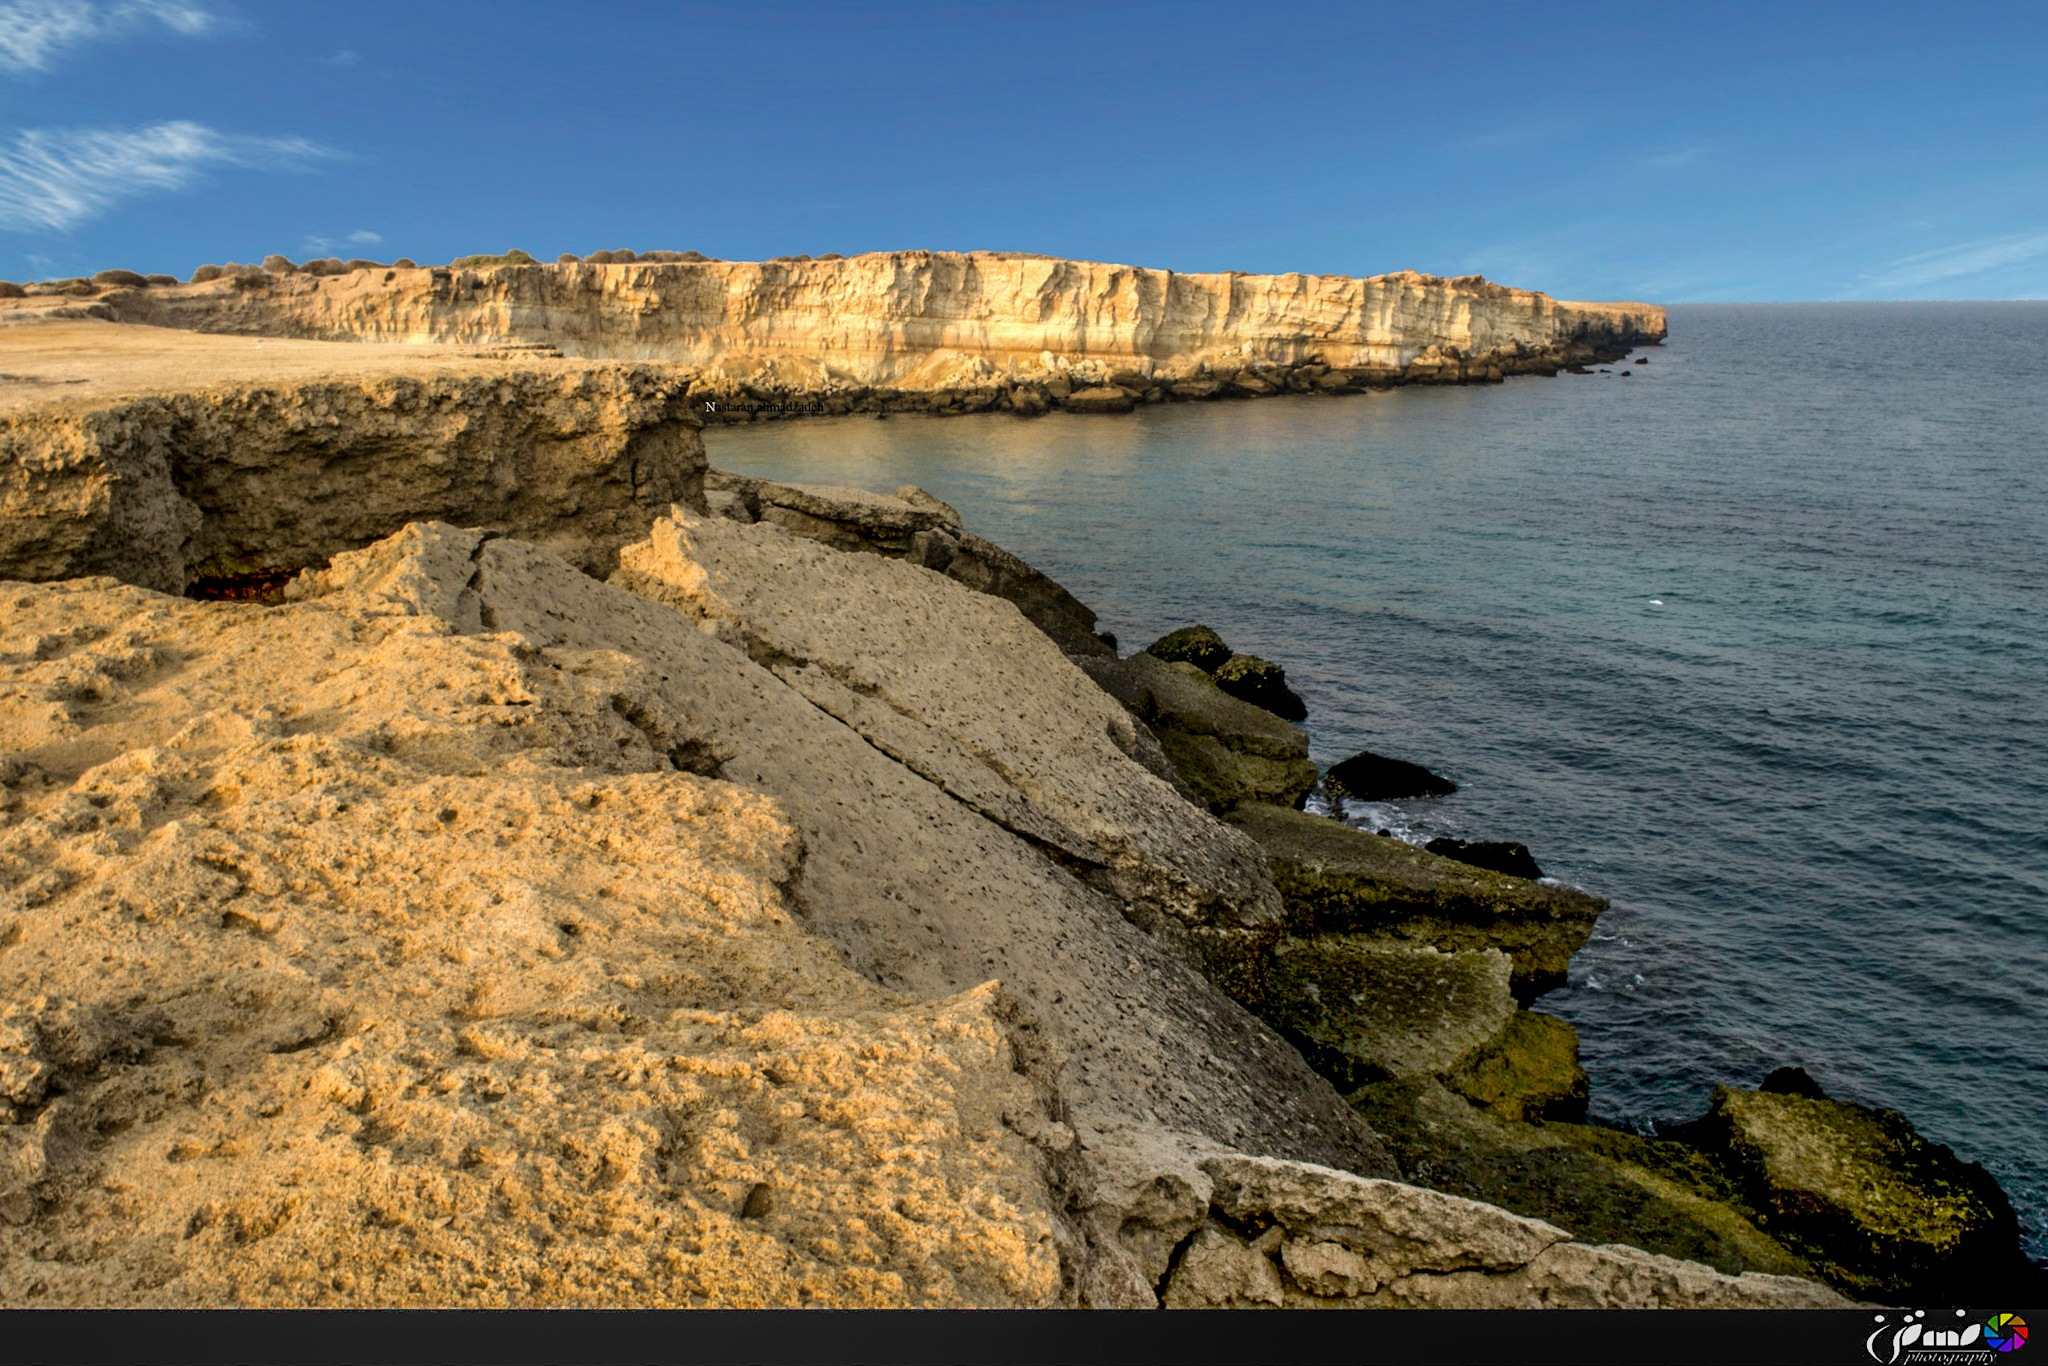 Nayband Gulf by nastaran.ahmadzadeh